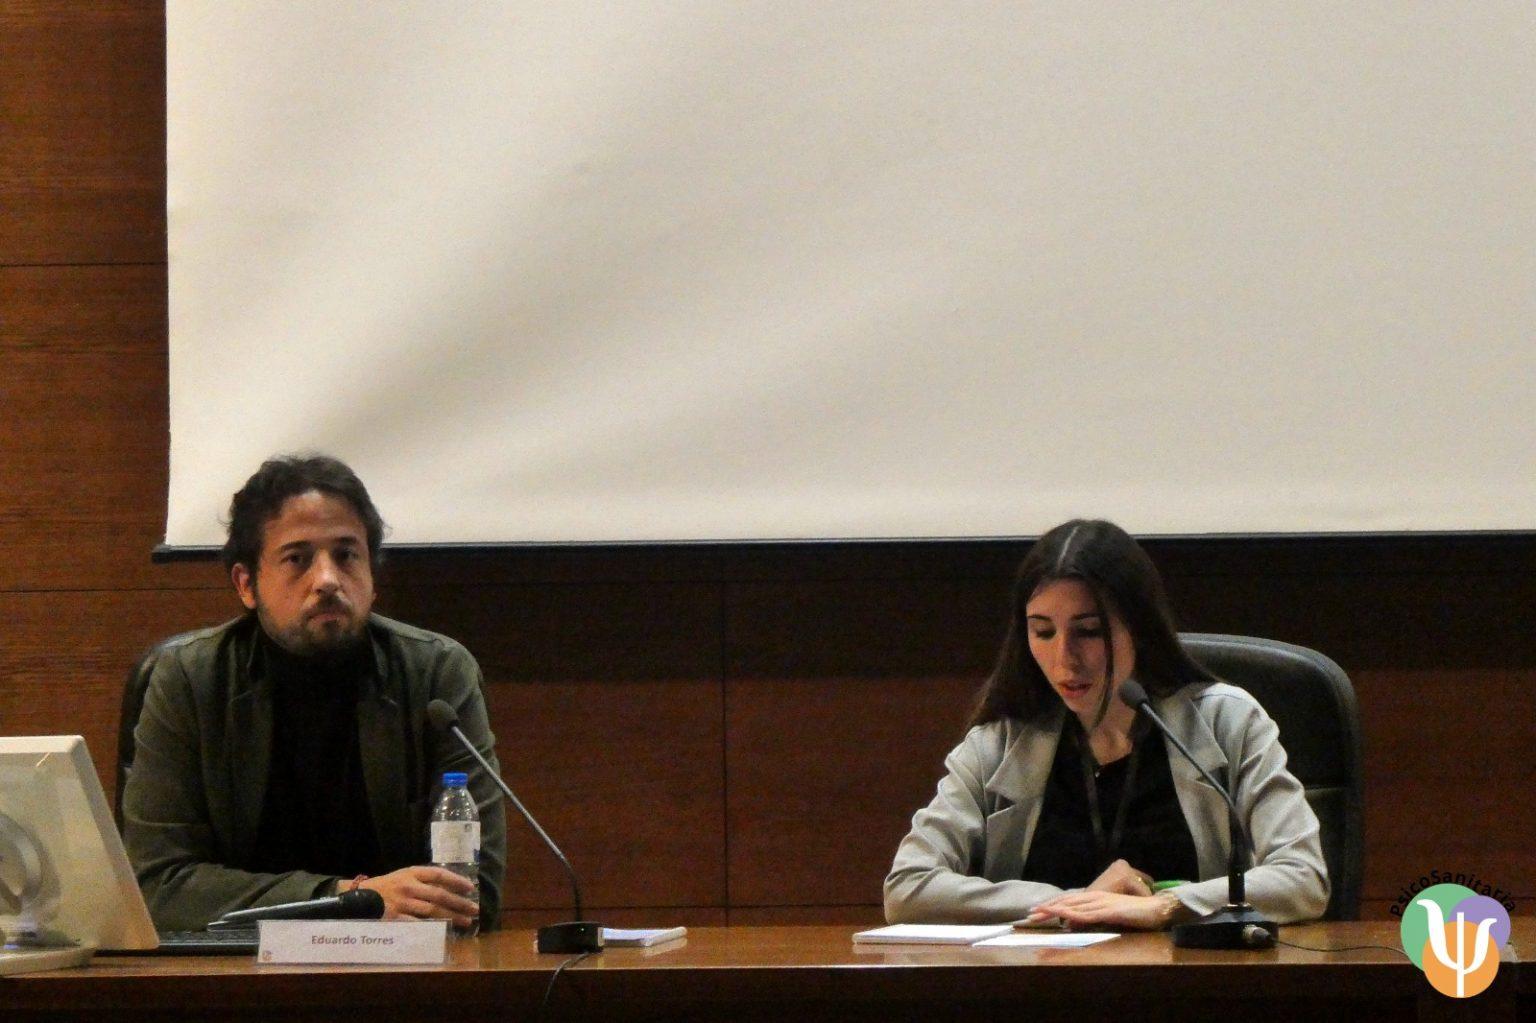 Conferencia: Eduardo Torres